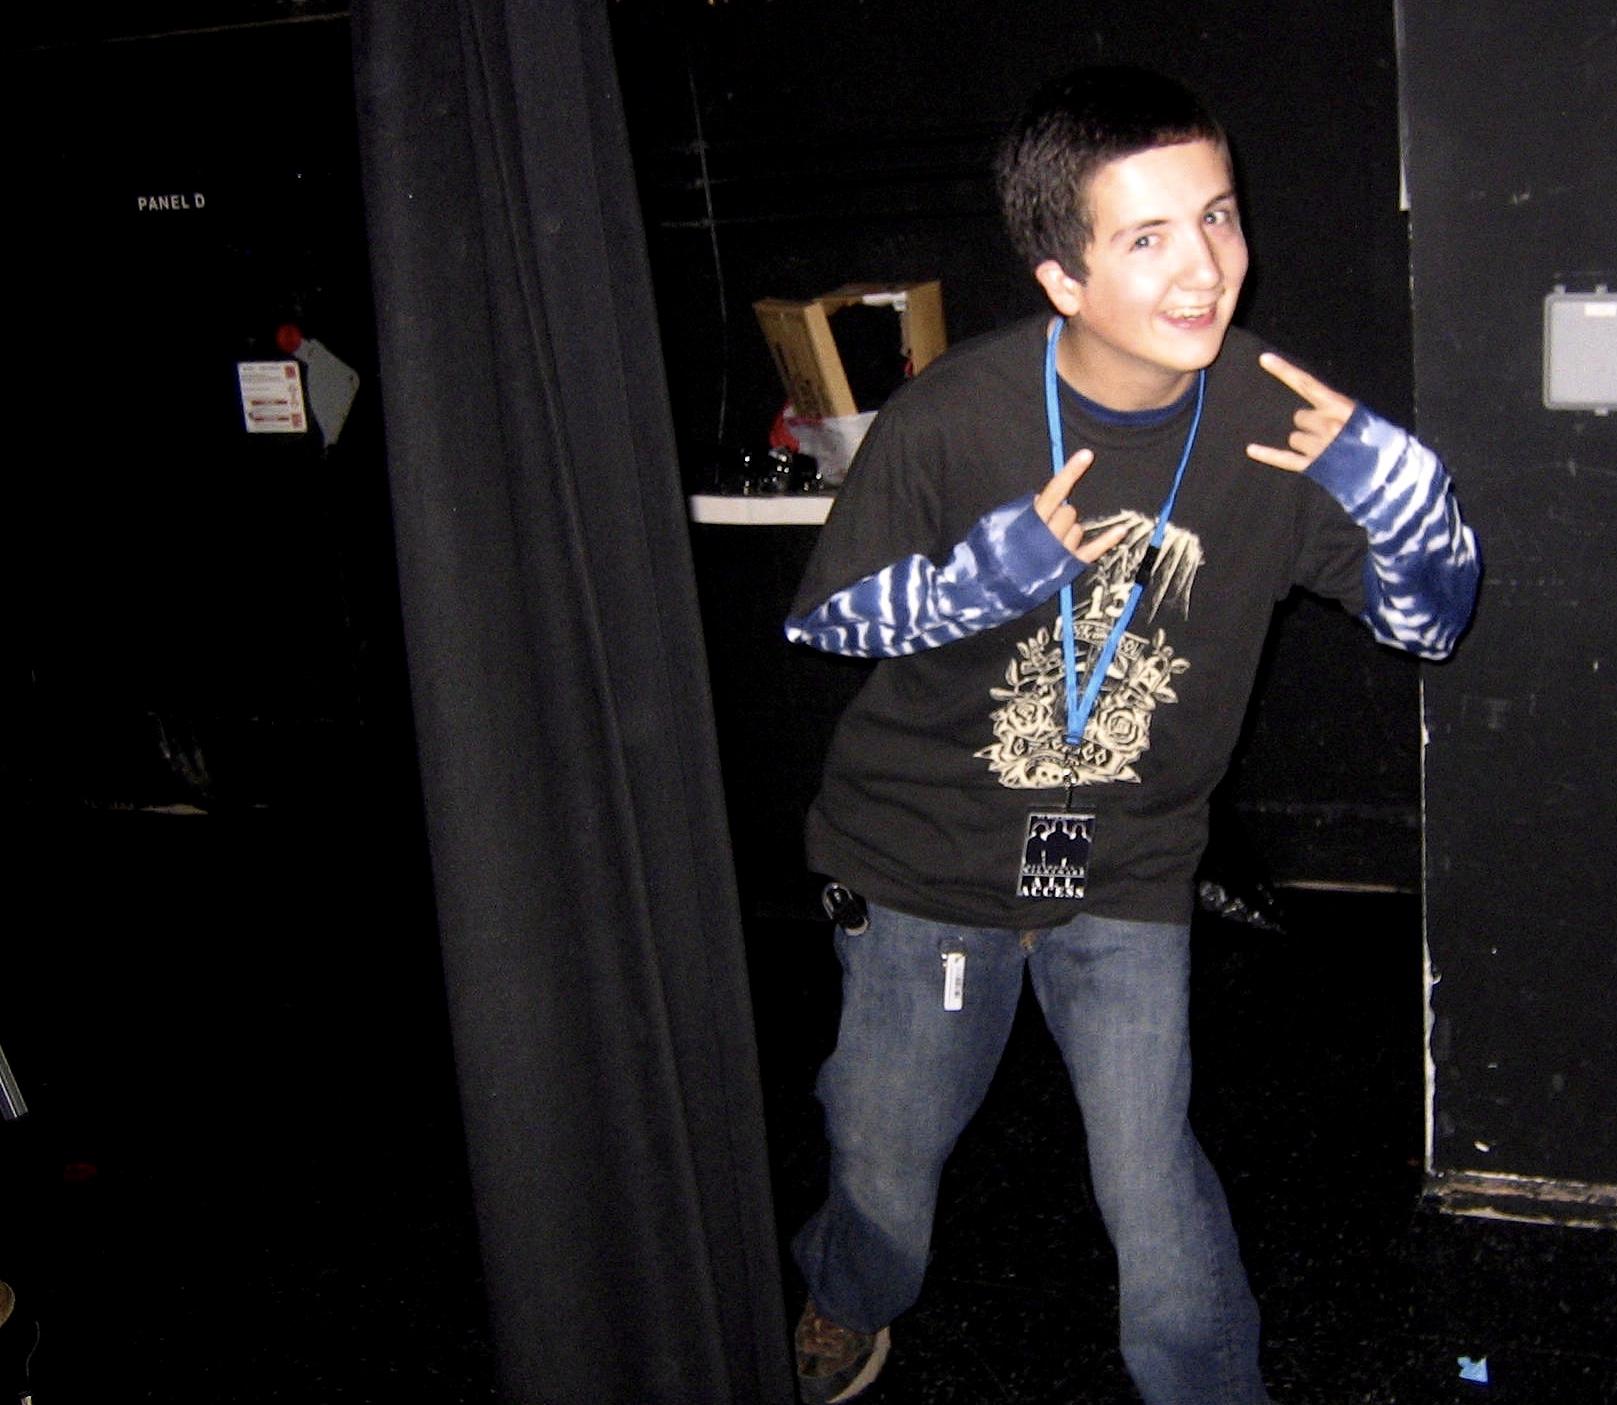 Street team volunteer Jonathan Vass backstage after GLAD & Sprint Relay's 2007 concert  Beethoven's Nightmare Live At The El Rey , produced by Bob Hiltermann, John Drouillard, and Natalie Drouillard.  Photo by Natalie Drouillard.